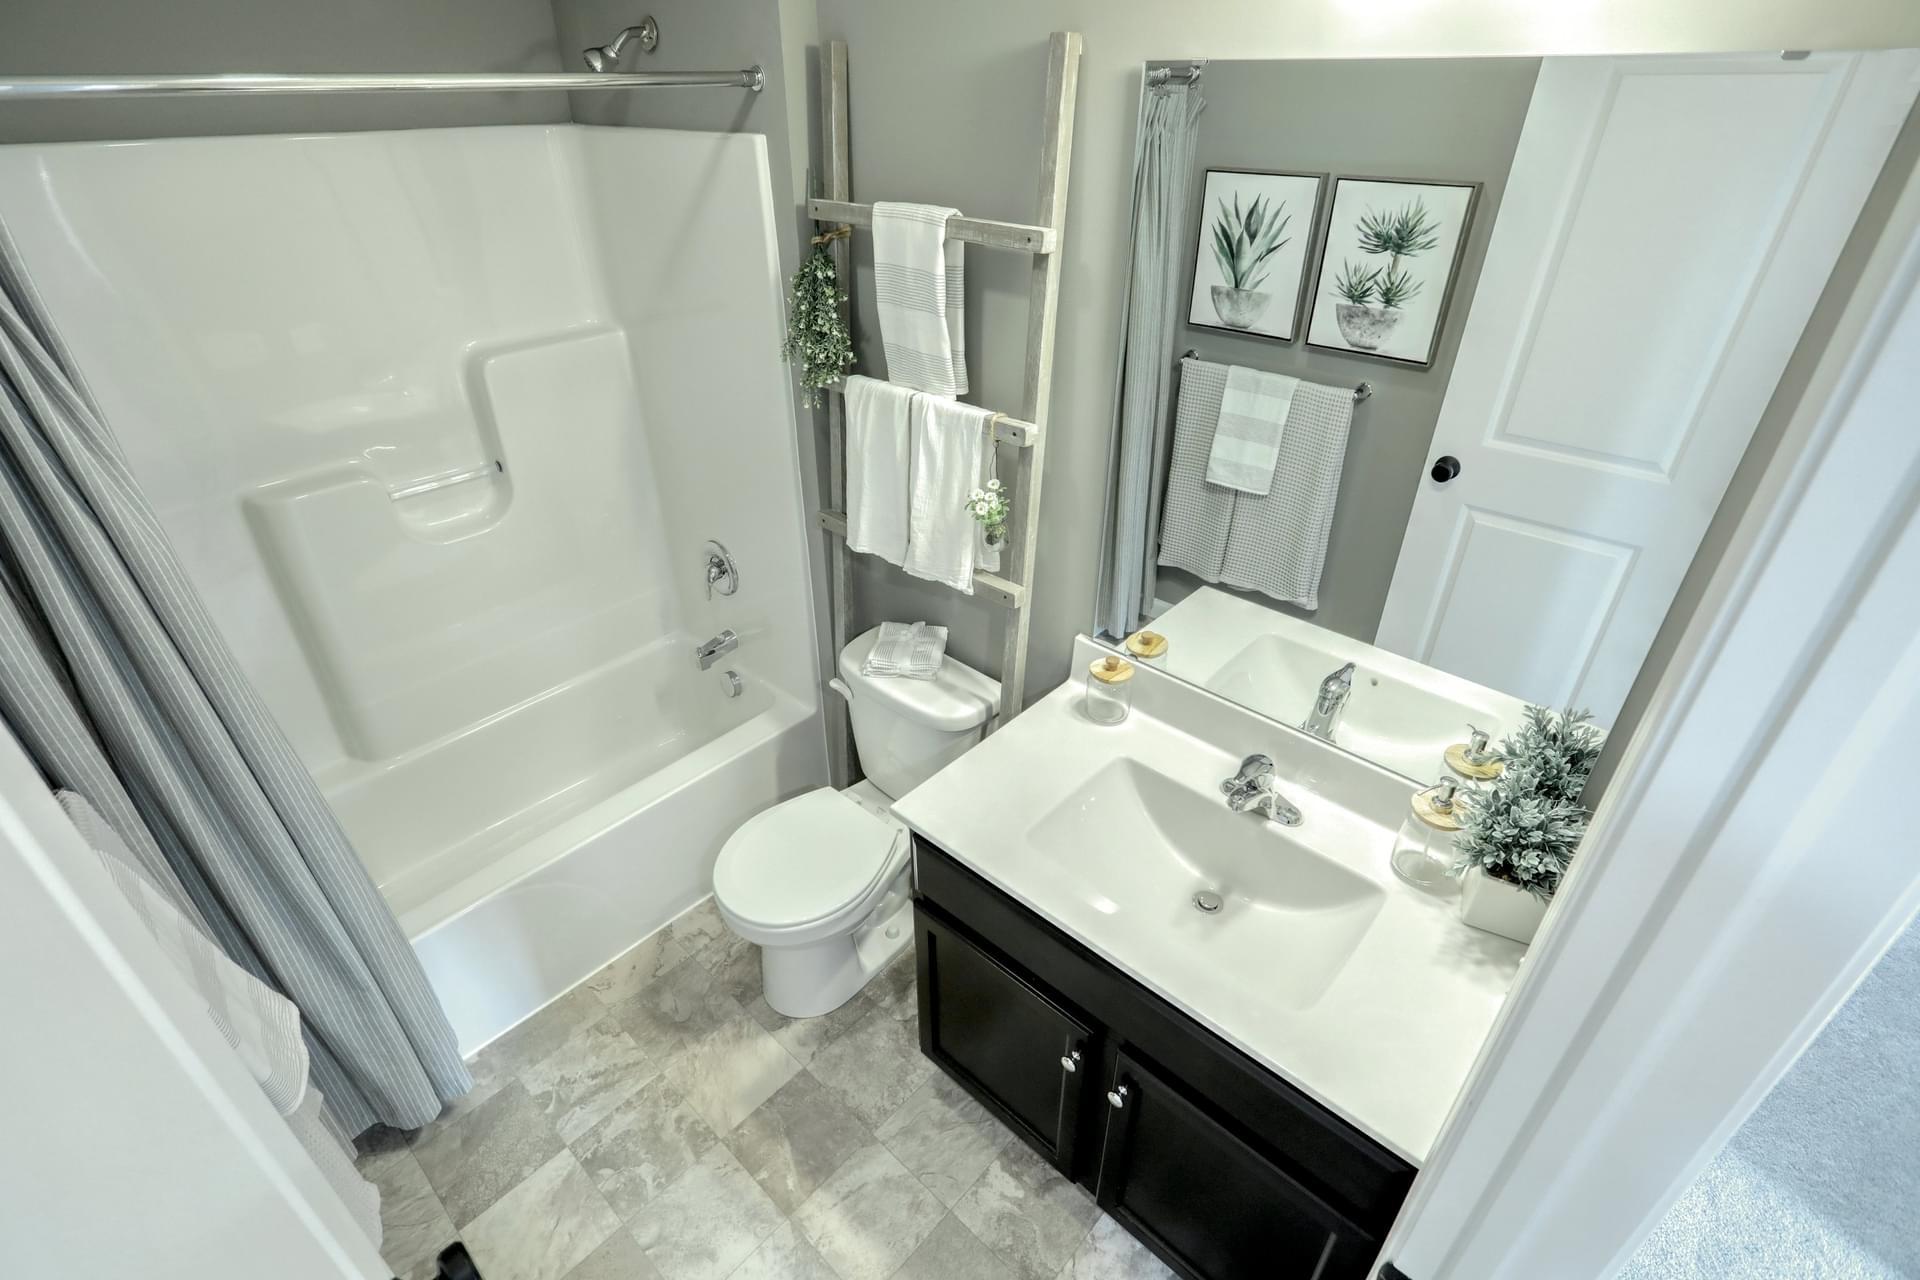 1,880sf New Home in Stewartstown, PA